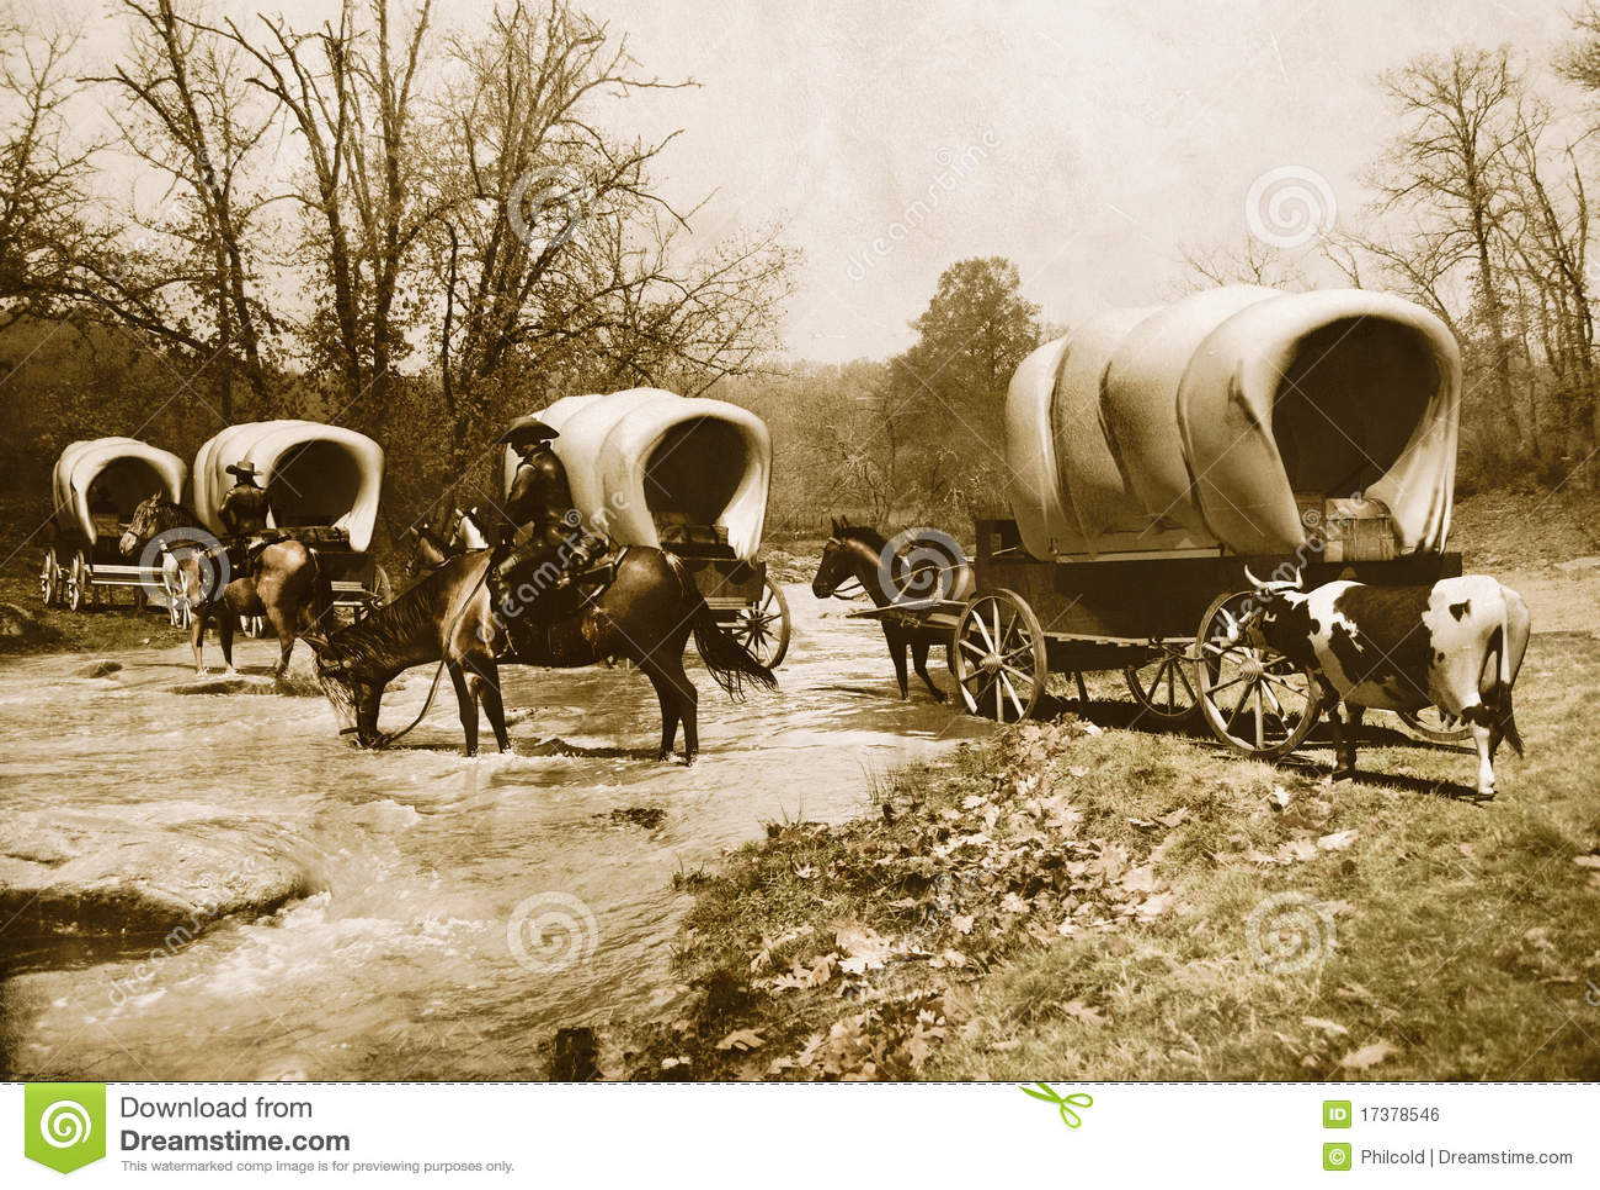 Wagon train old sepia